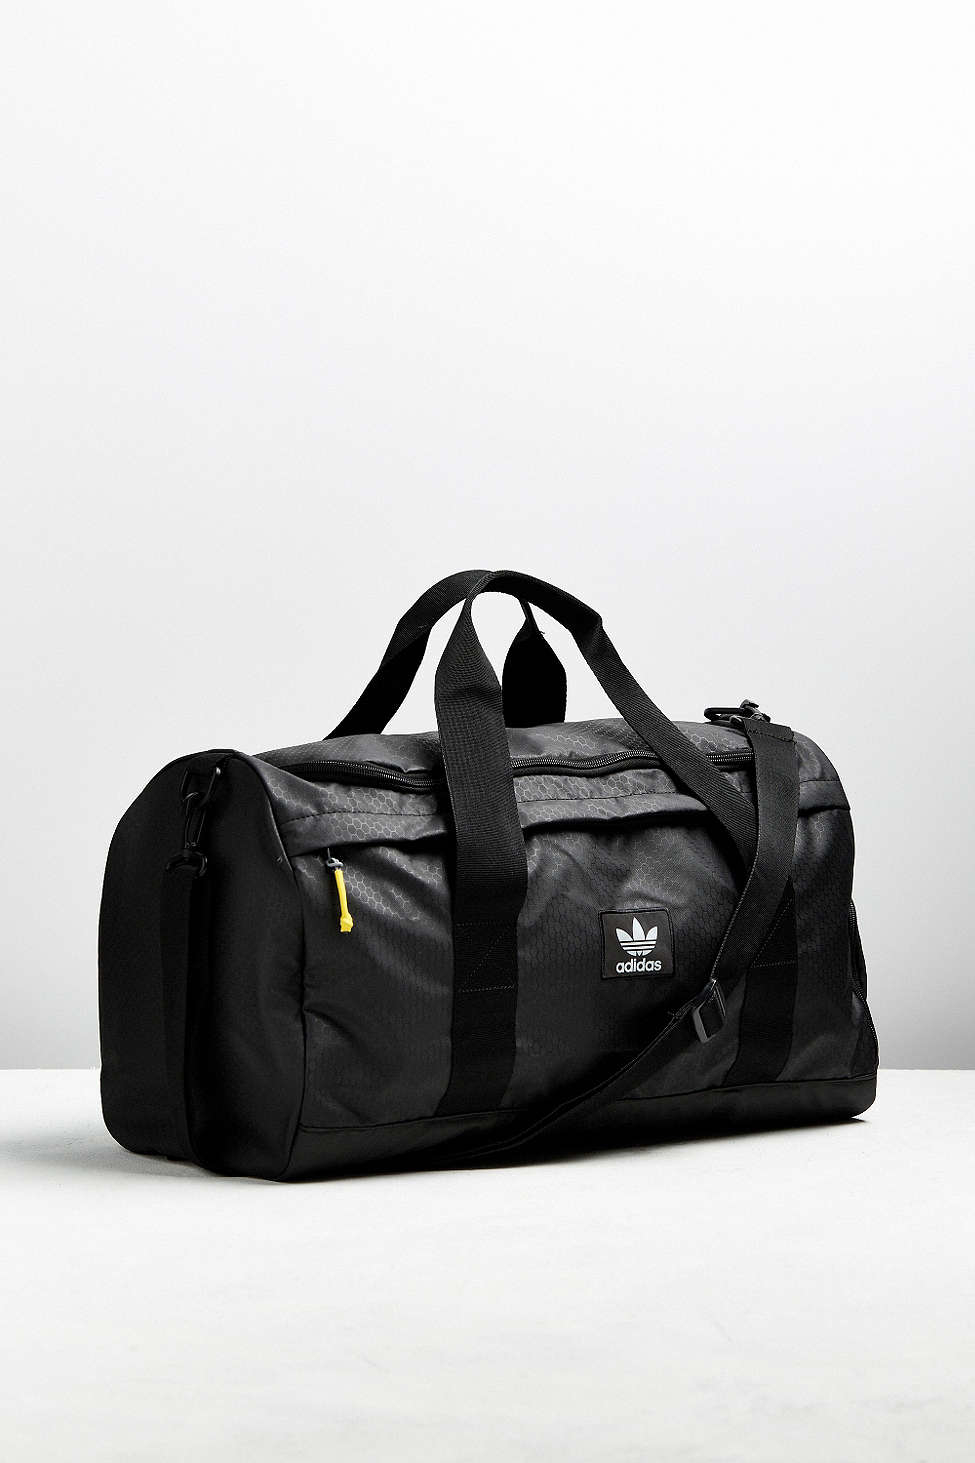 Lyst - adidas Originals National Duffel Bag in Black for Men bbe064a0b1